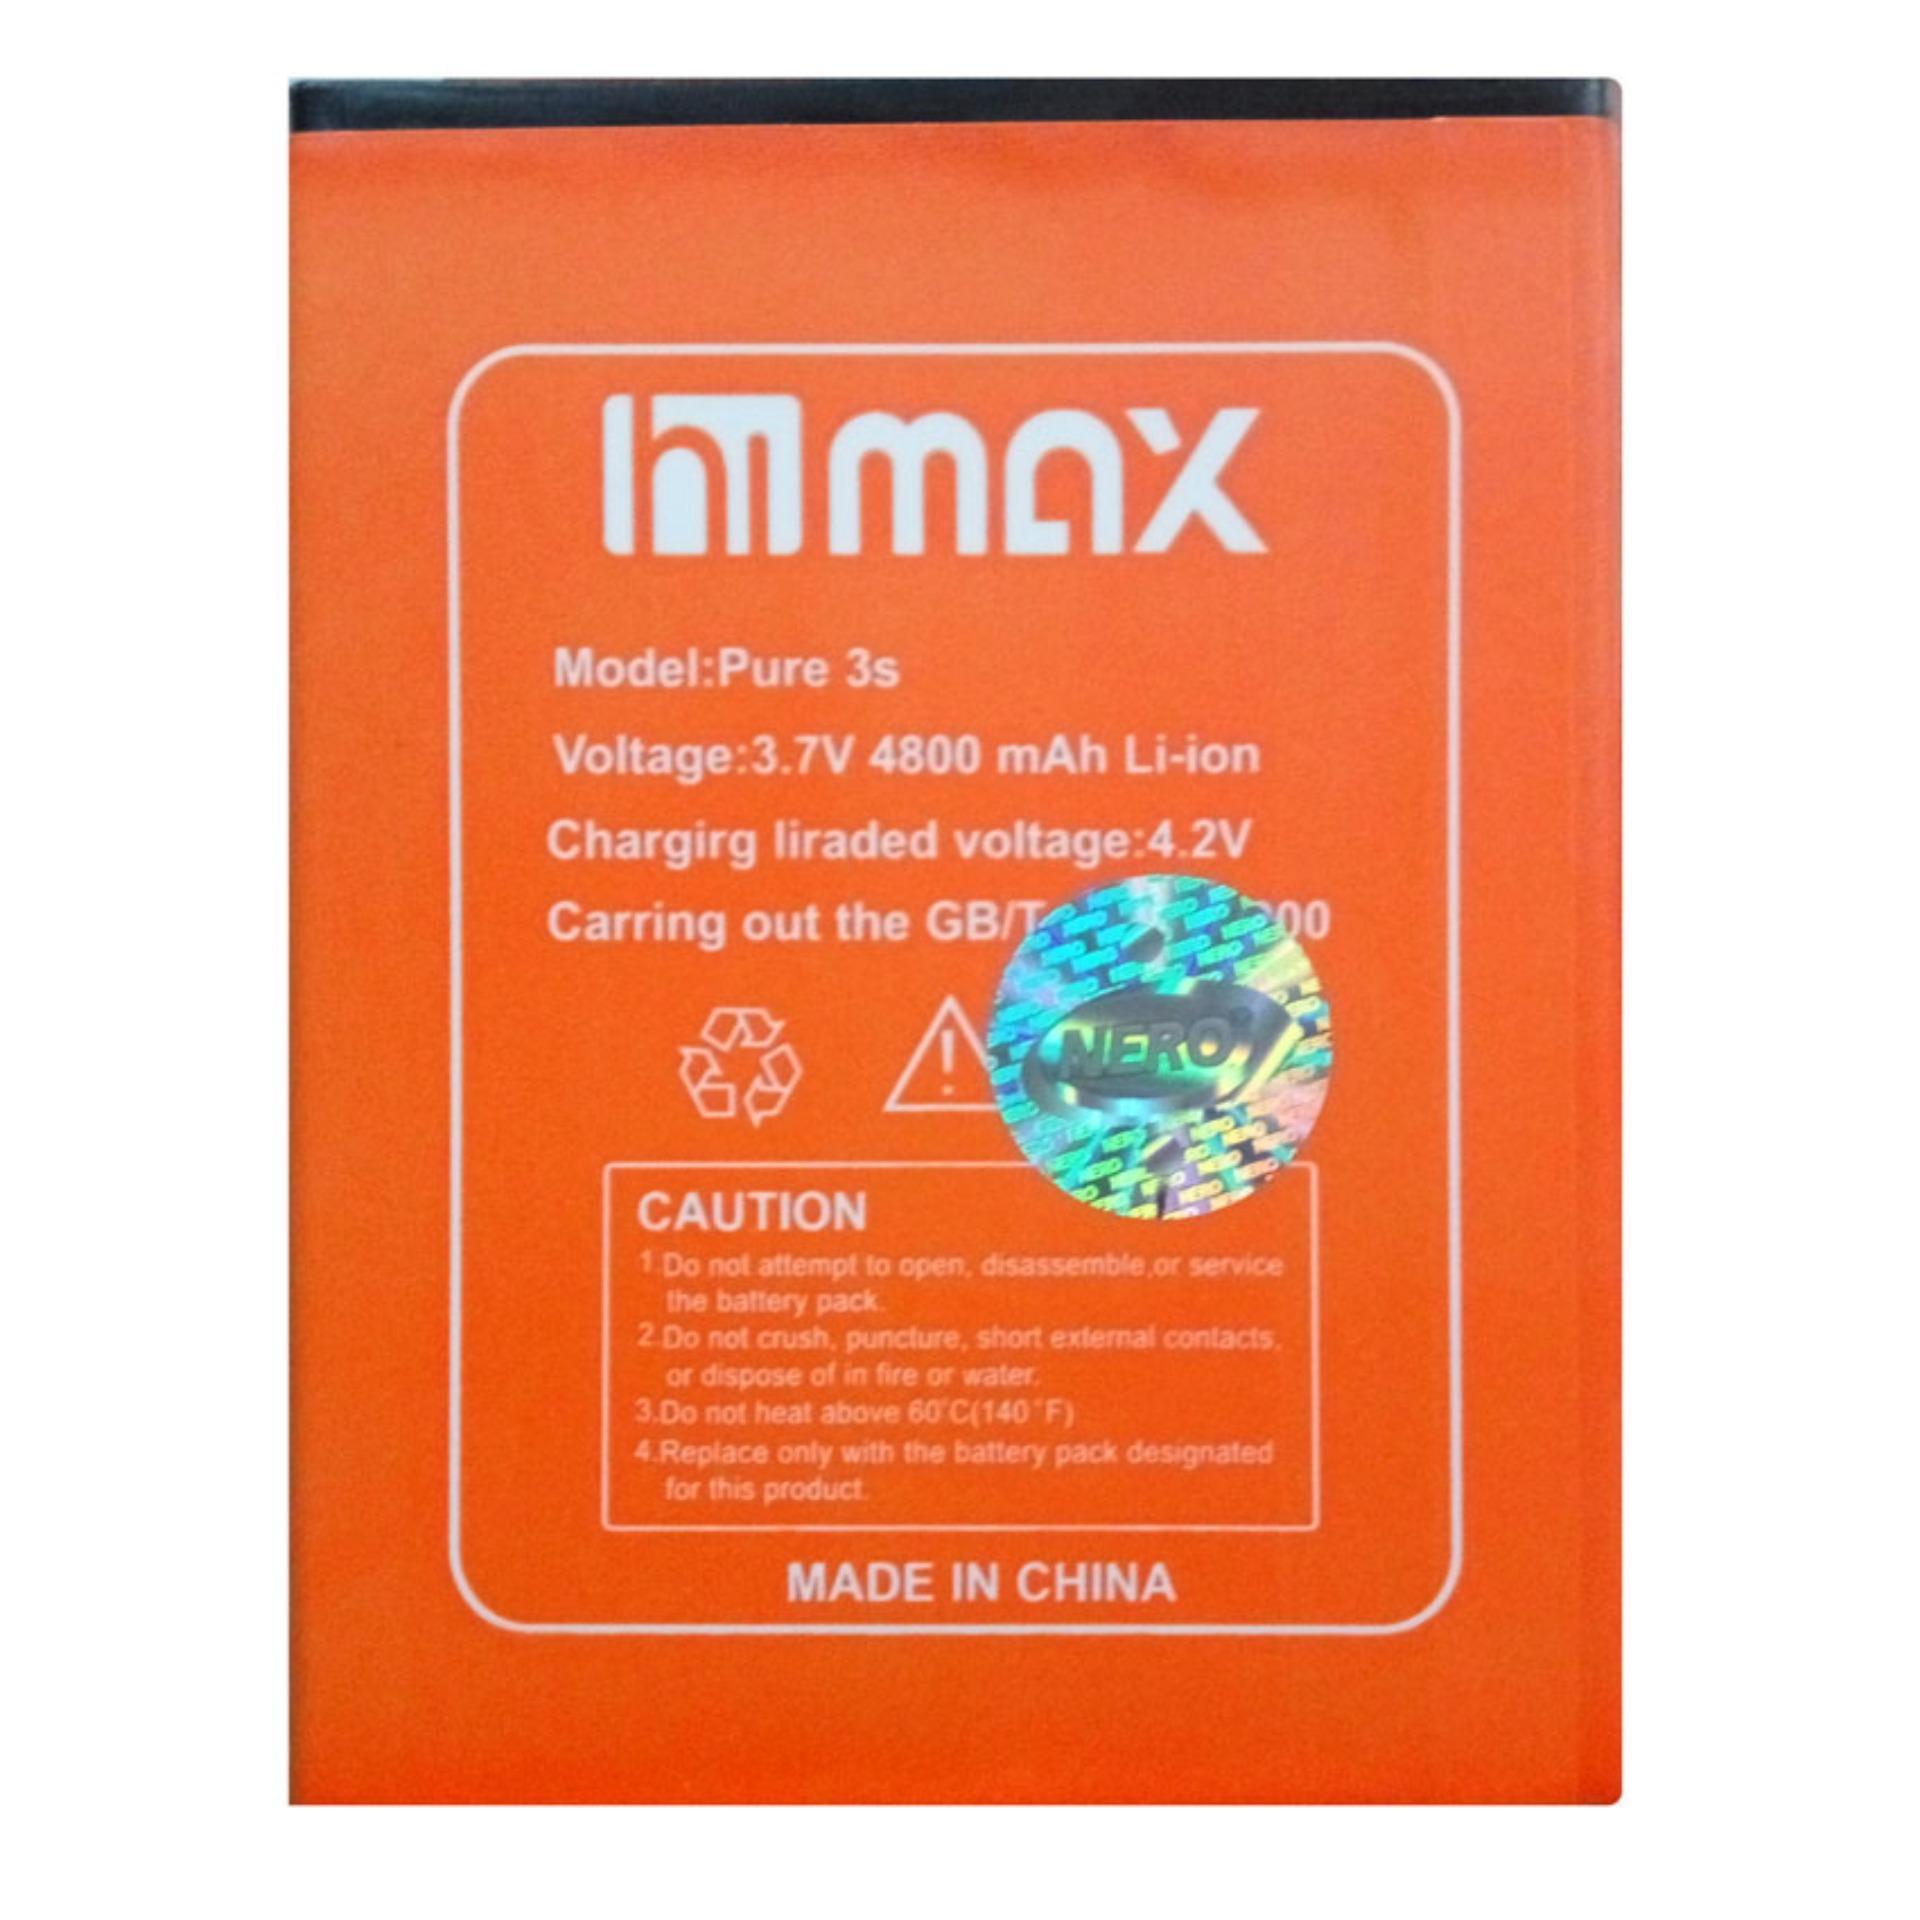 Himax Baterai Original Battery for Himax Pure 3S / KLB2 / ON340 - 4800 mAh